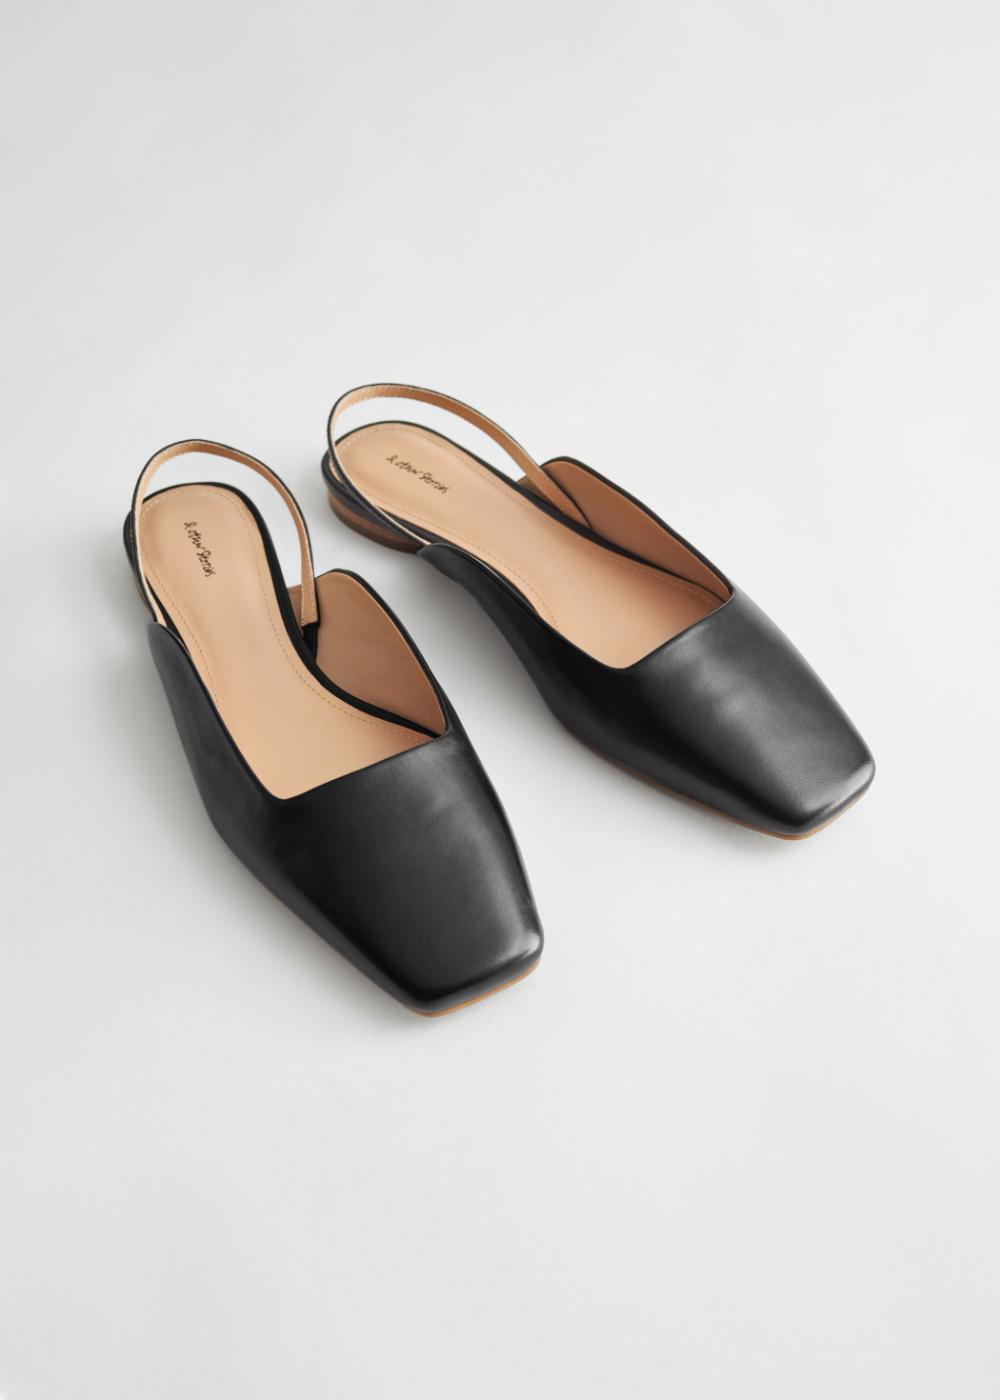 leather black flats